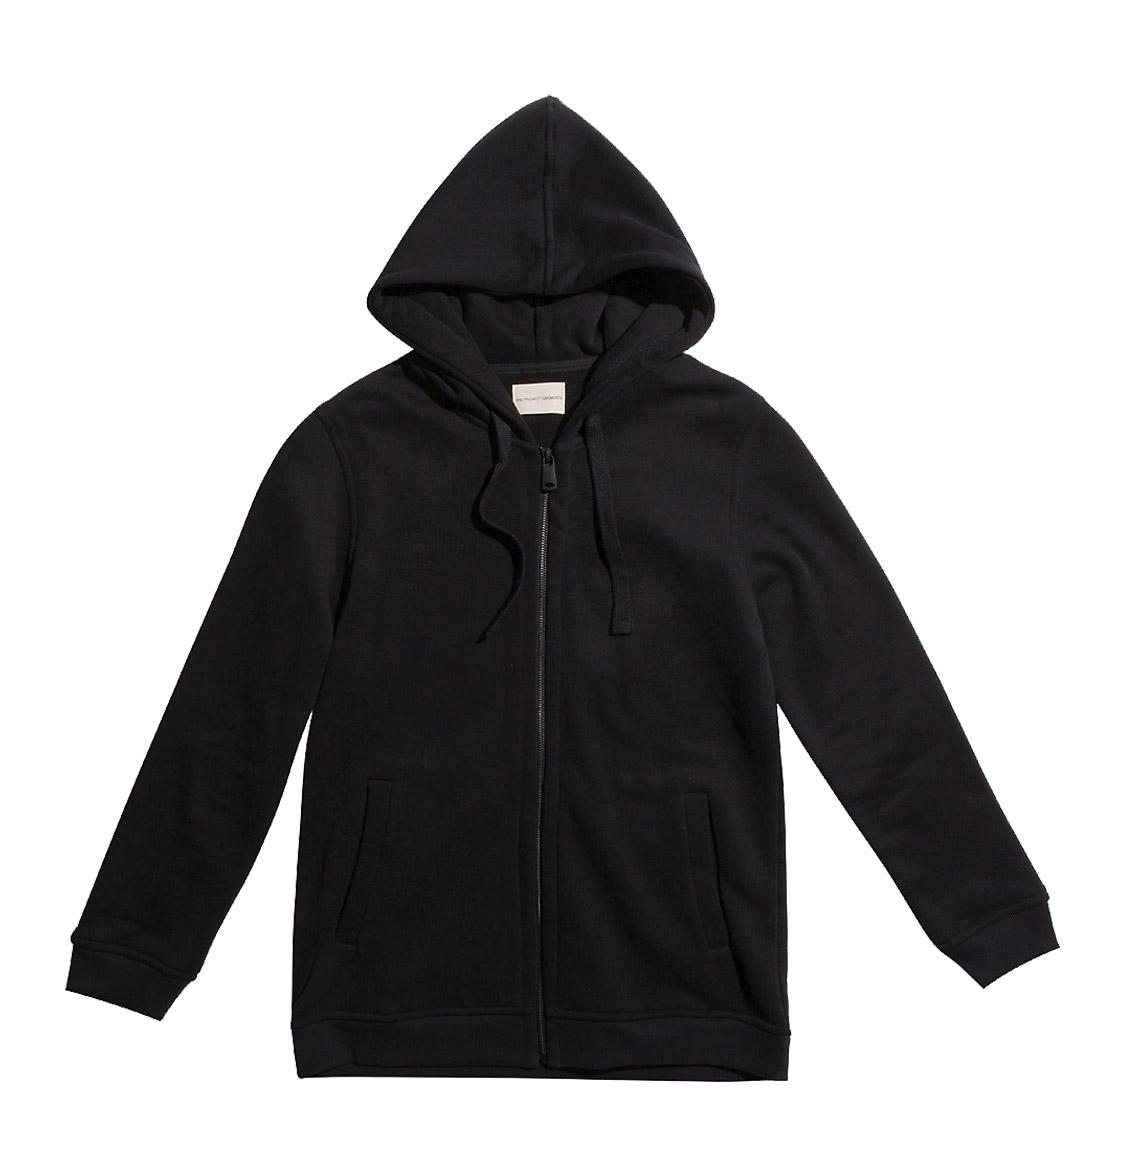 Organic Cotton Zip Up Hoodie Black